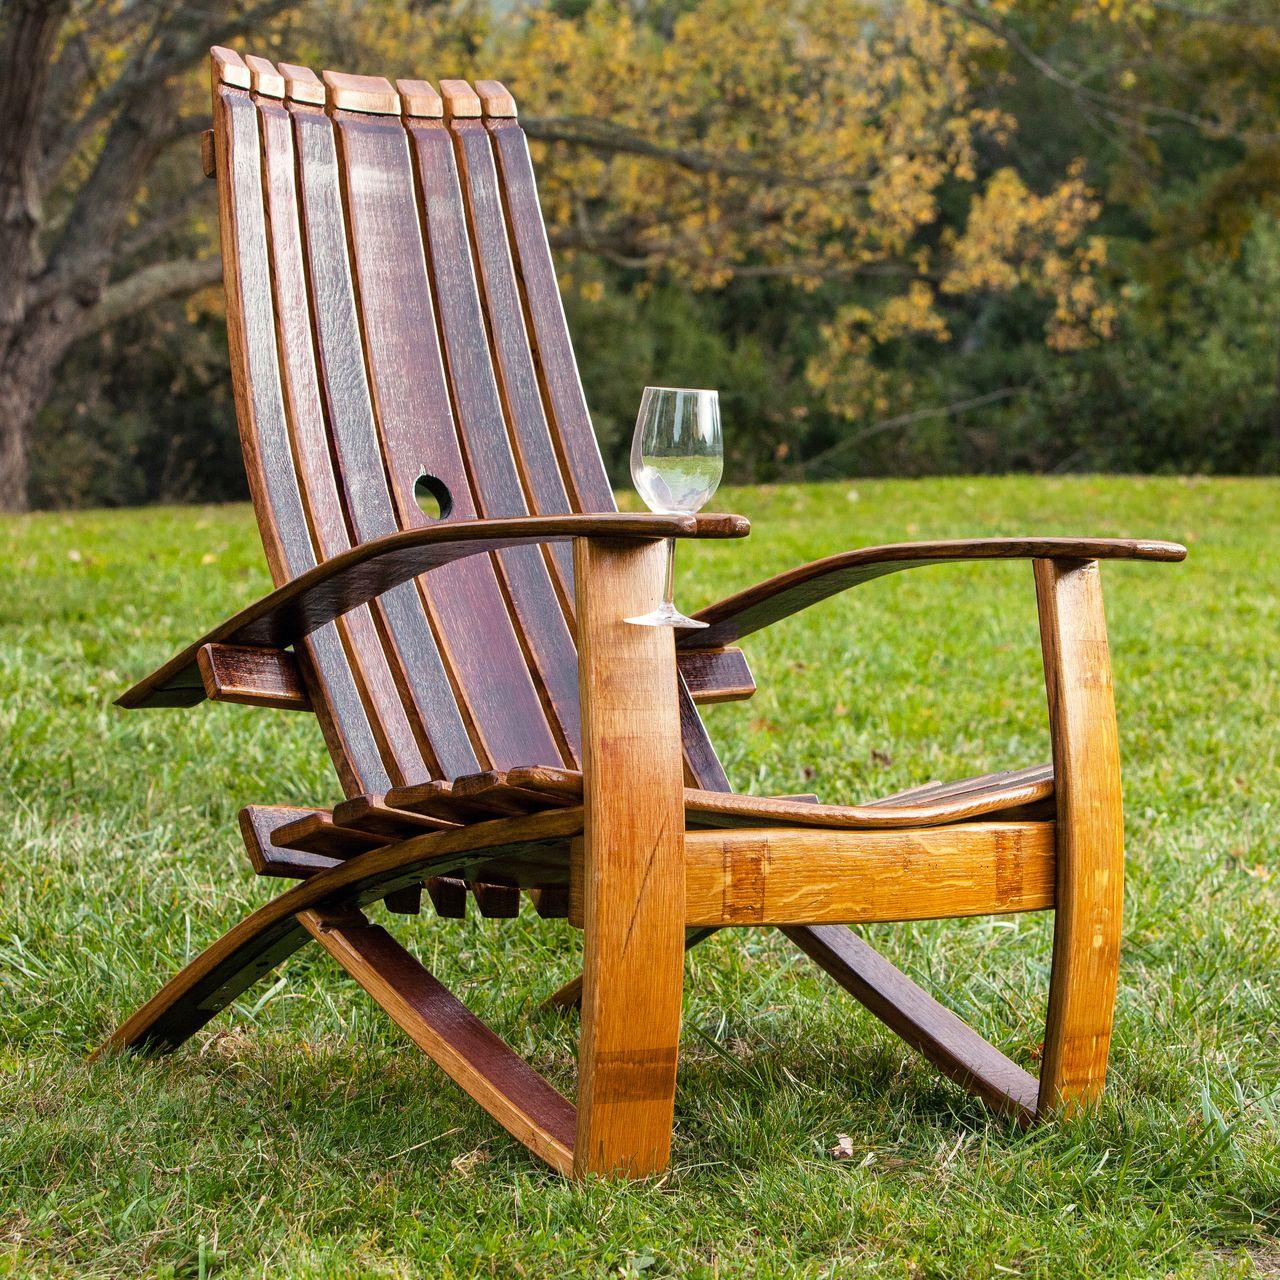 Wine Barrel Adirondack Chair Creative Uses Wine Barrel Chairs